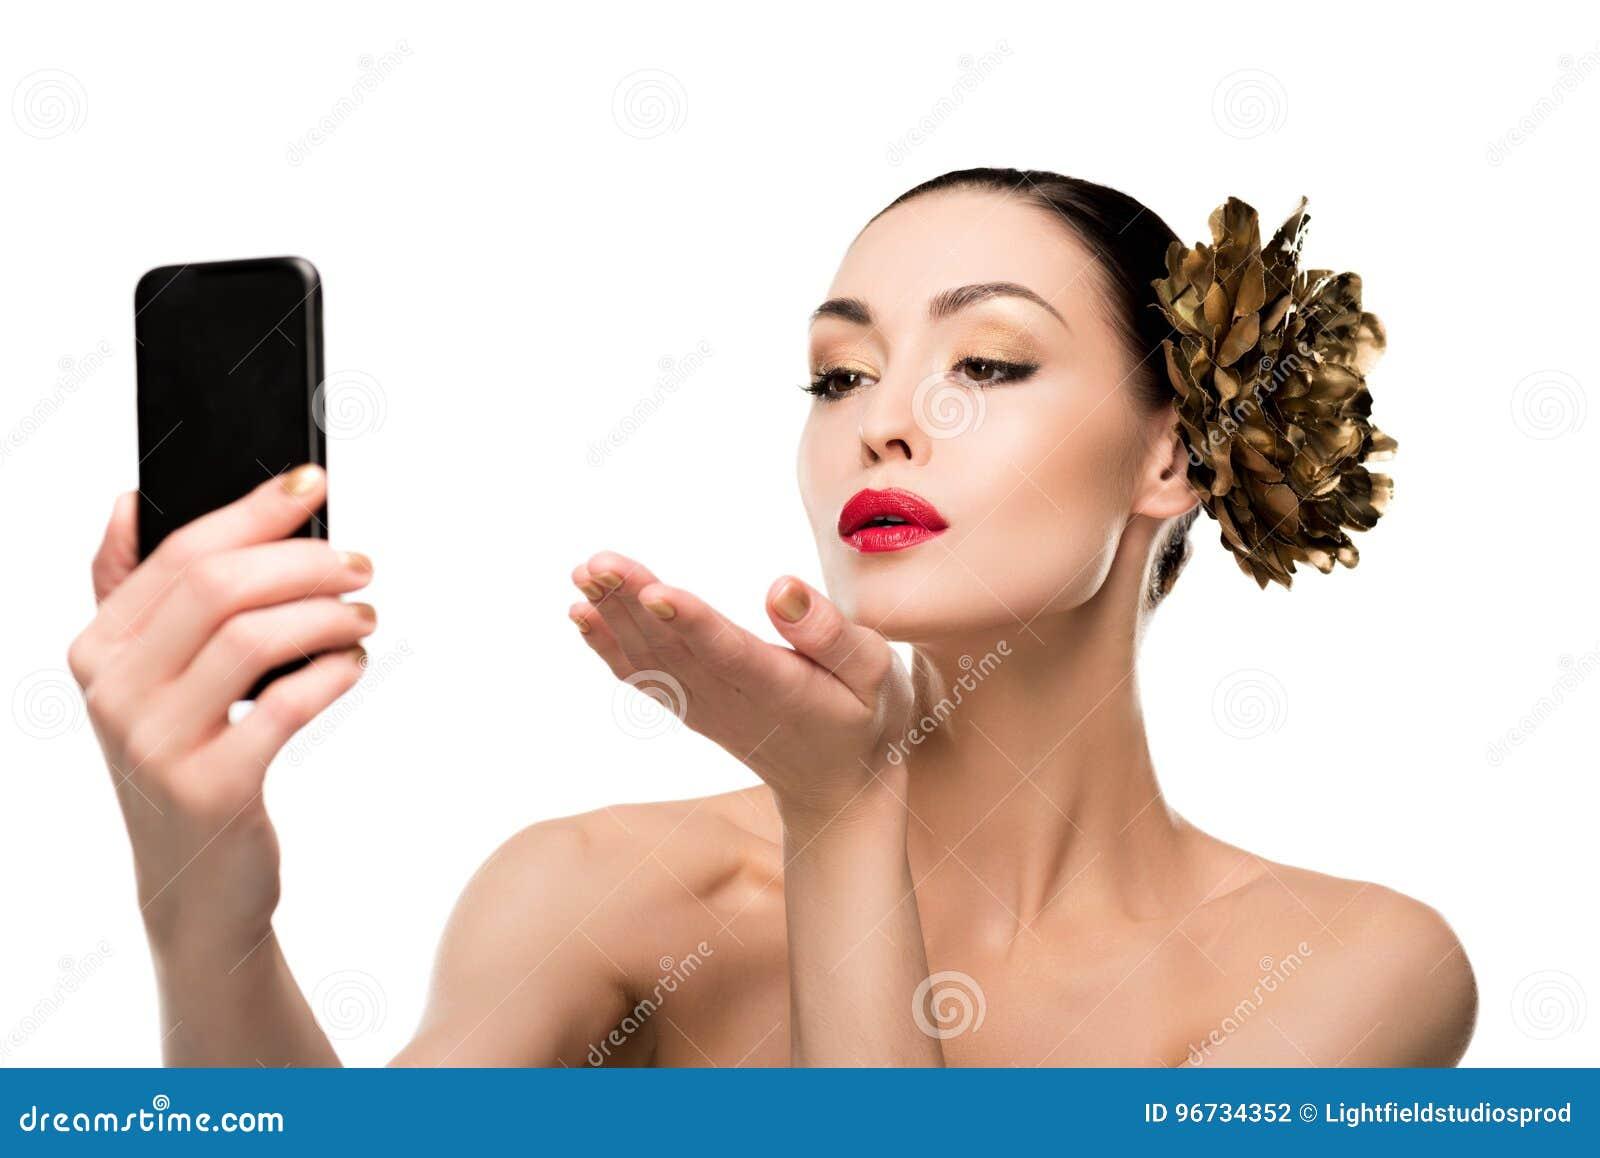 Sexy naked women blowing women oof seems